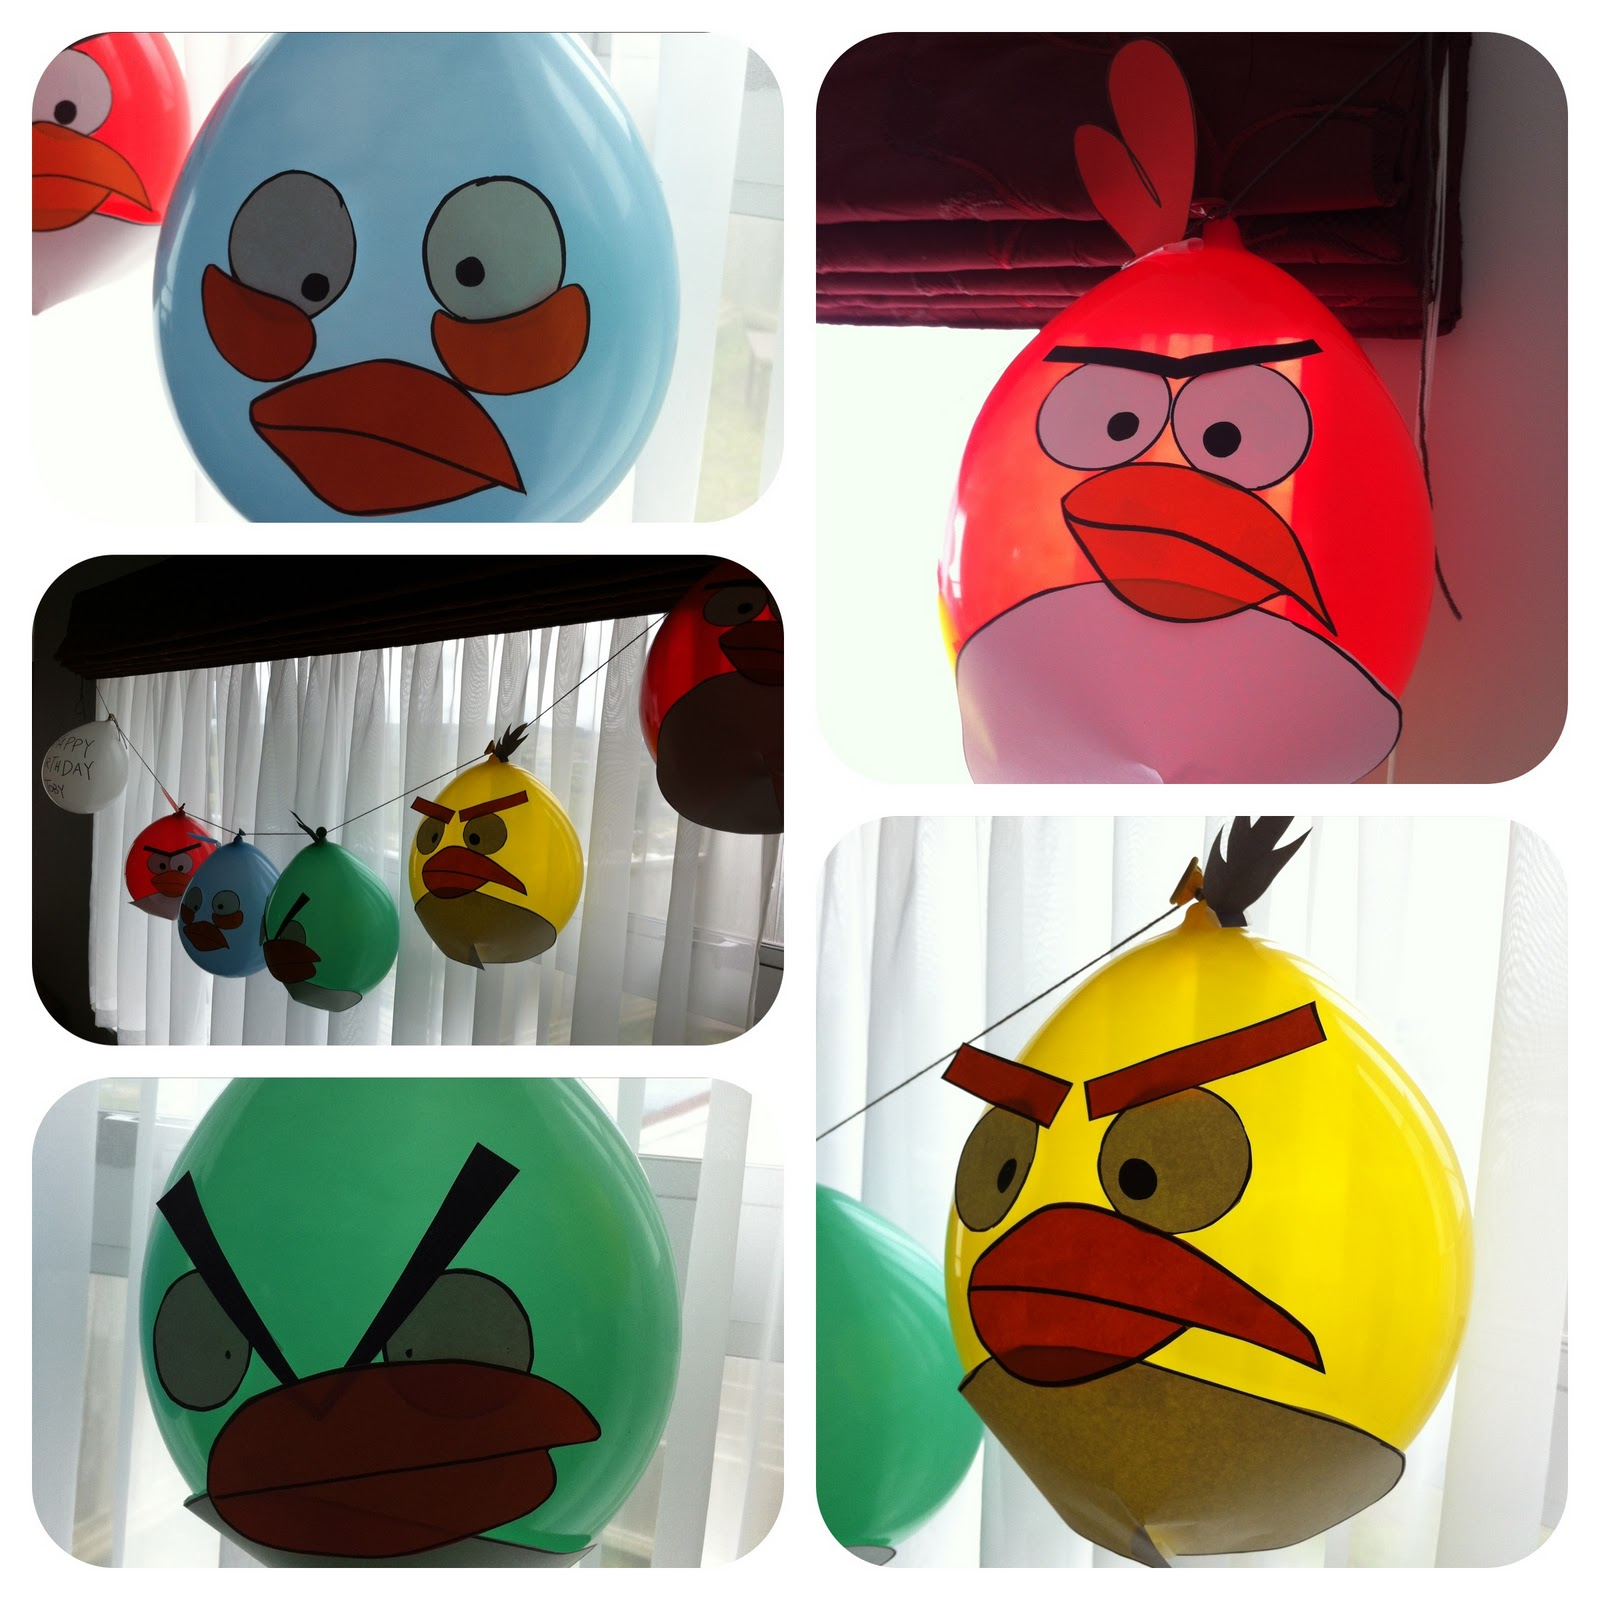 Goshorty: The Angry Birds Birthday